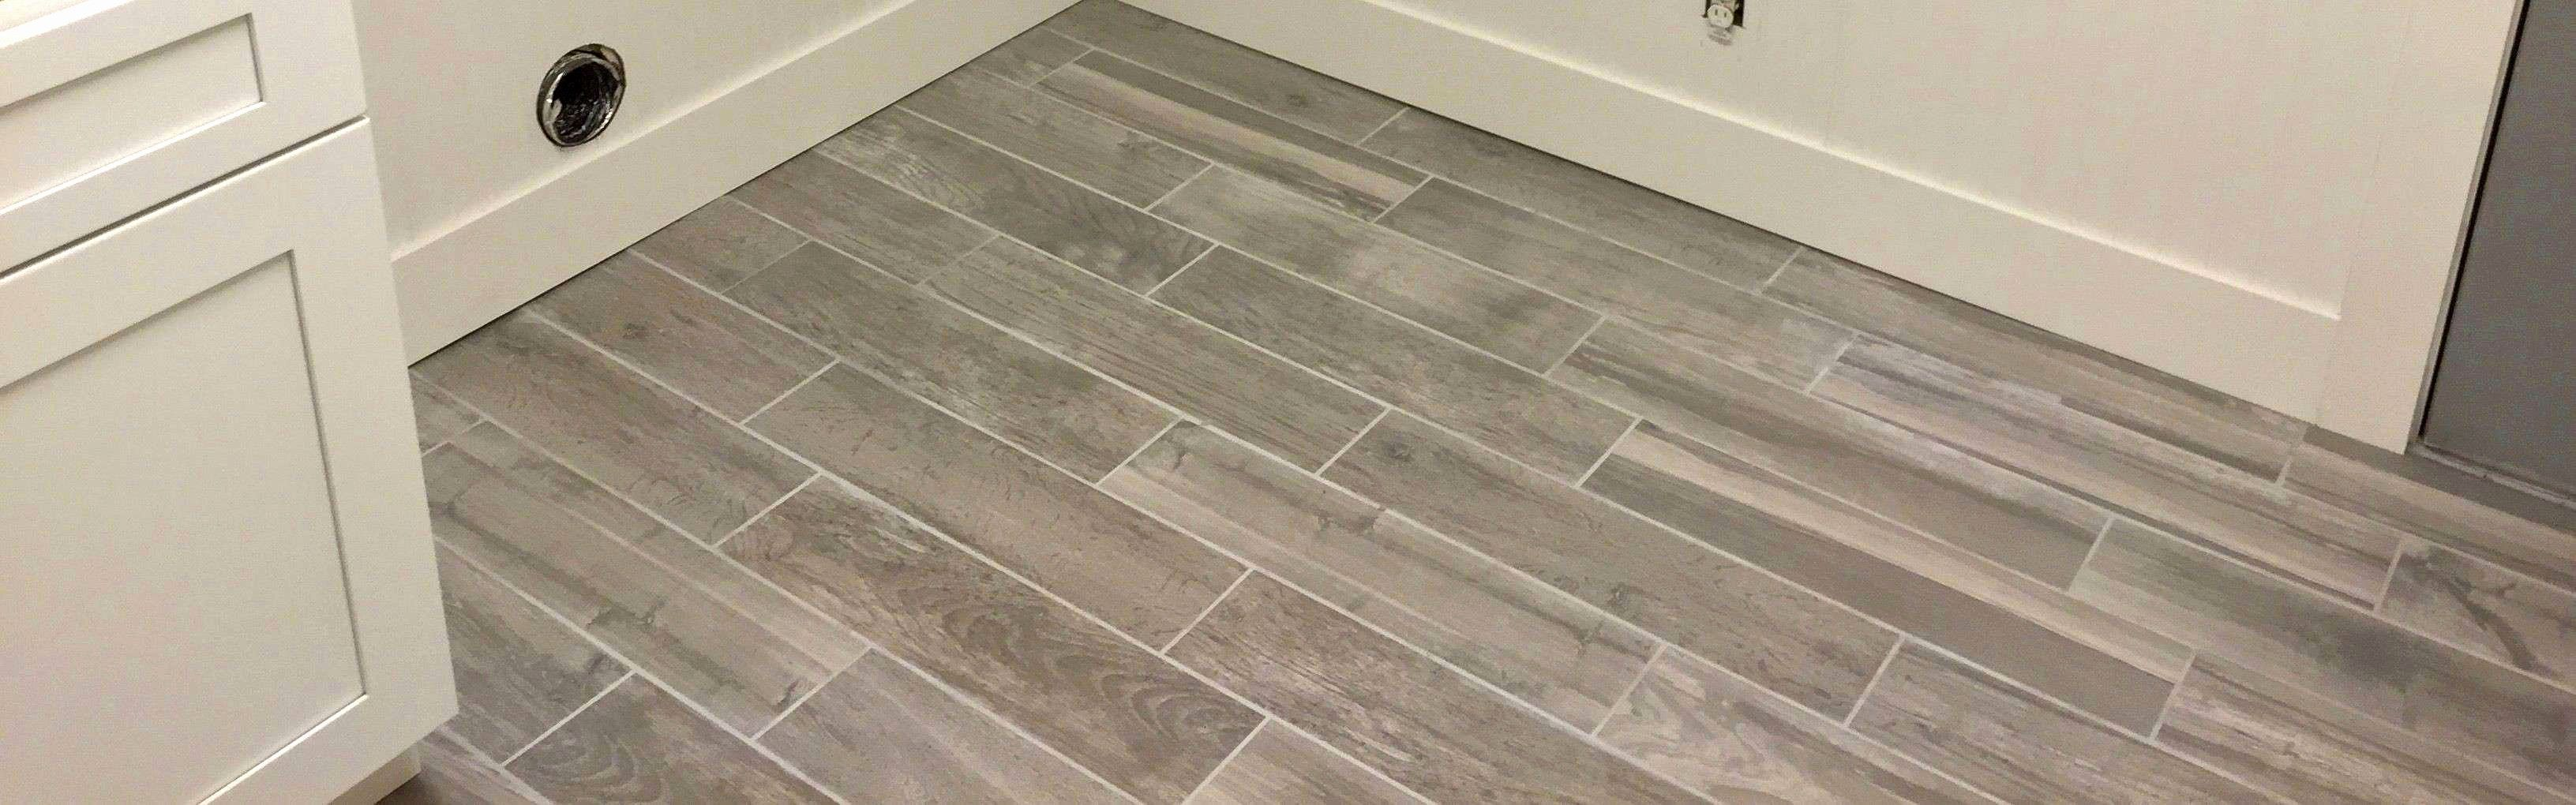 11 Famous Cost To Install Unfinished Hardwood Floors Installing Vinyl Plank Flooring Installing Laminate Flooring Flooring